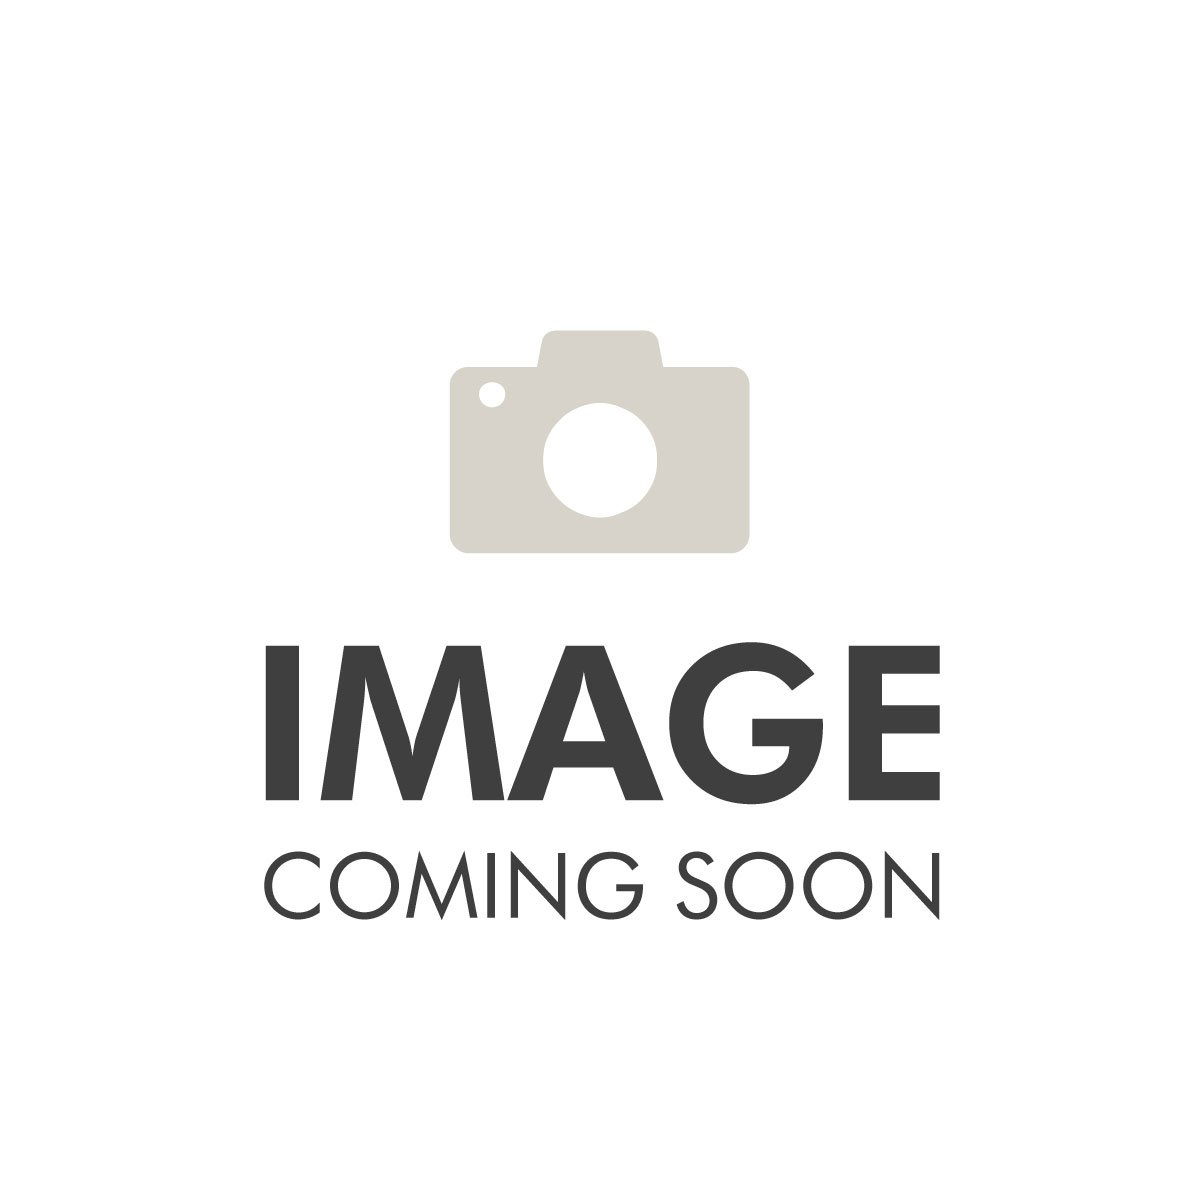 Negrini - Fil de corps 2-pin - Transparent